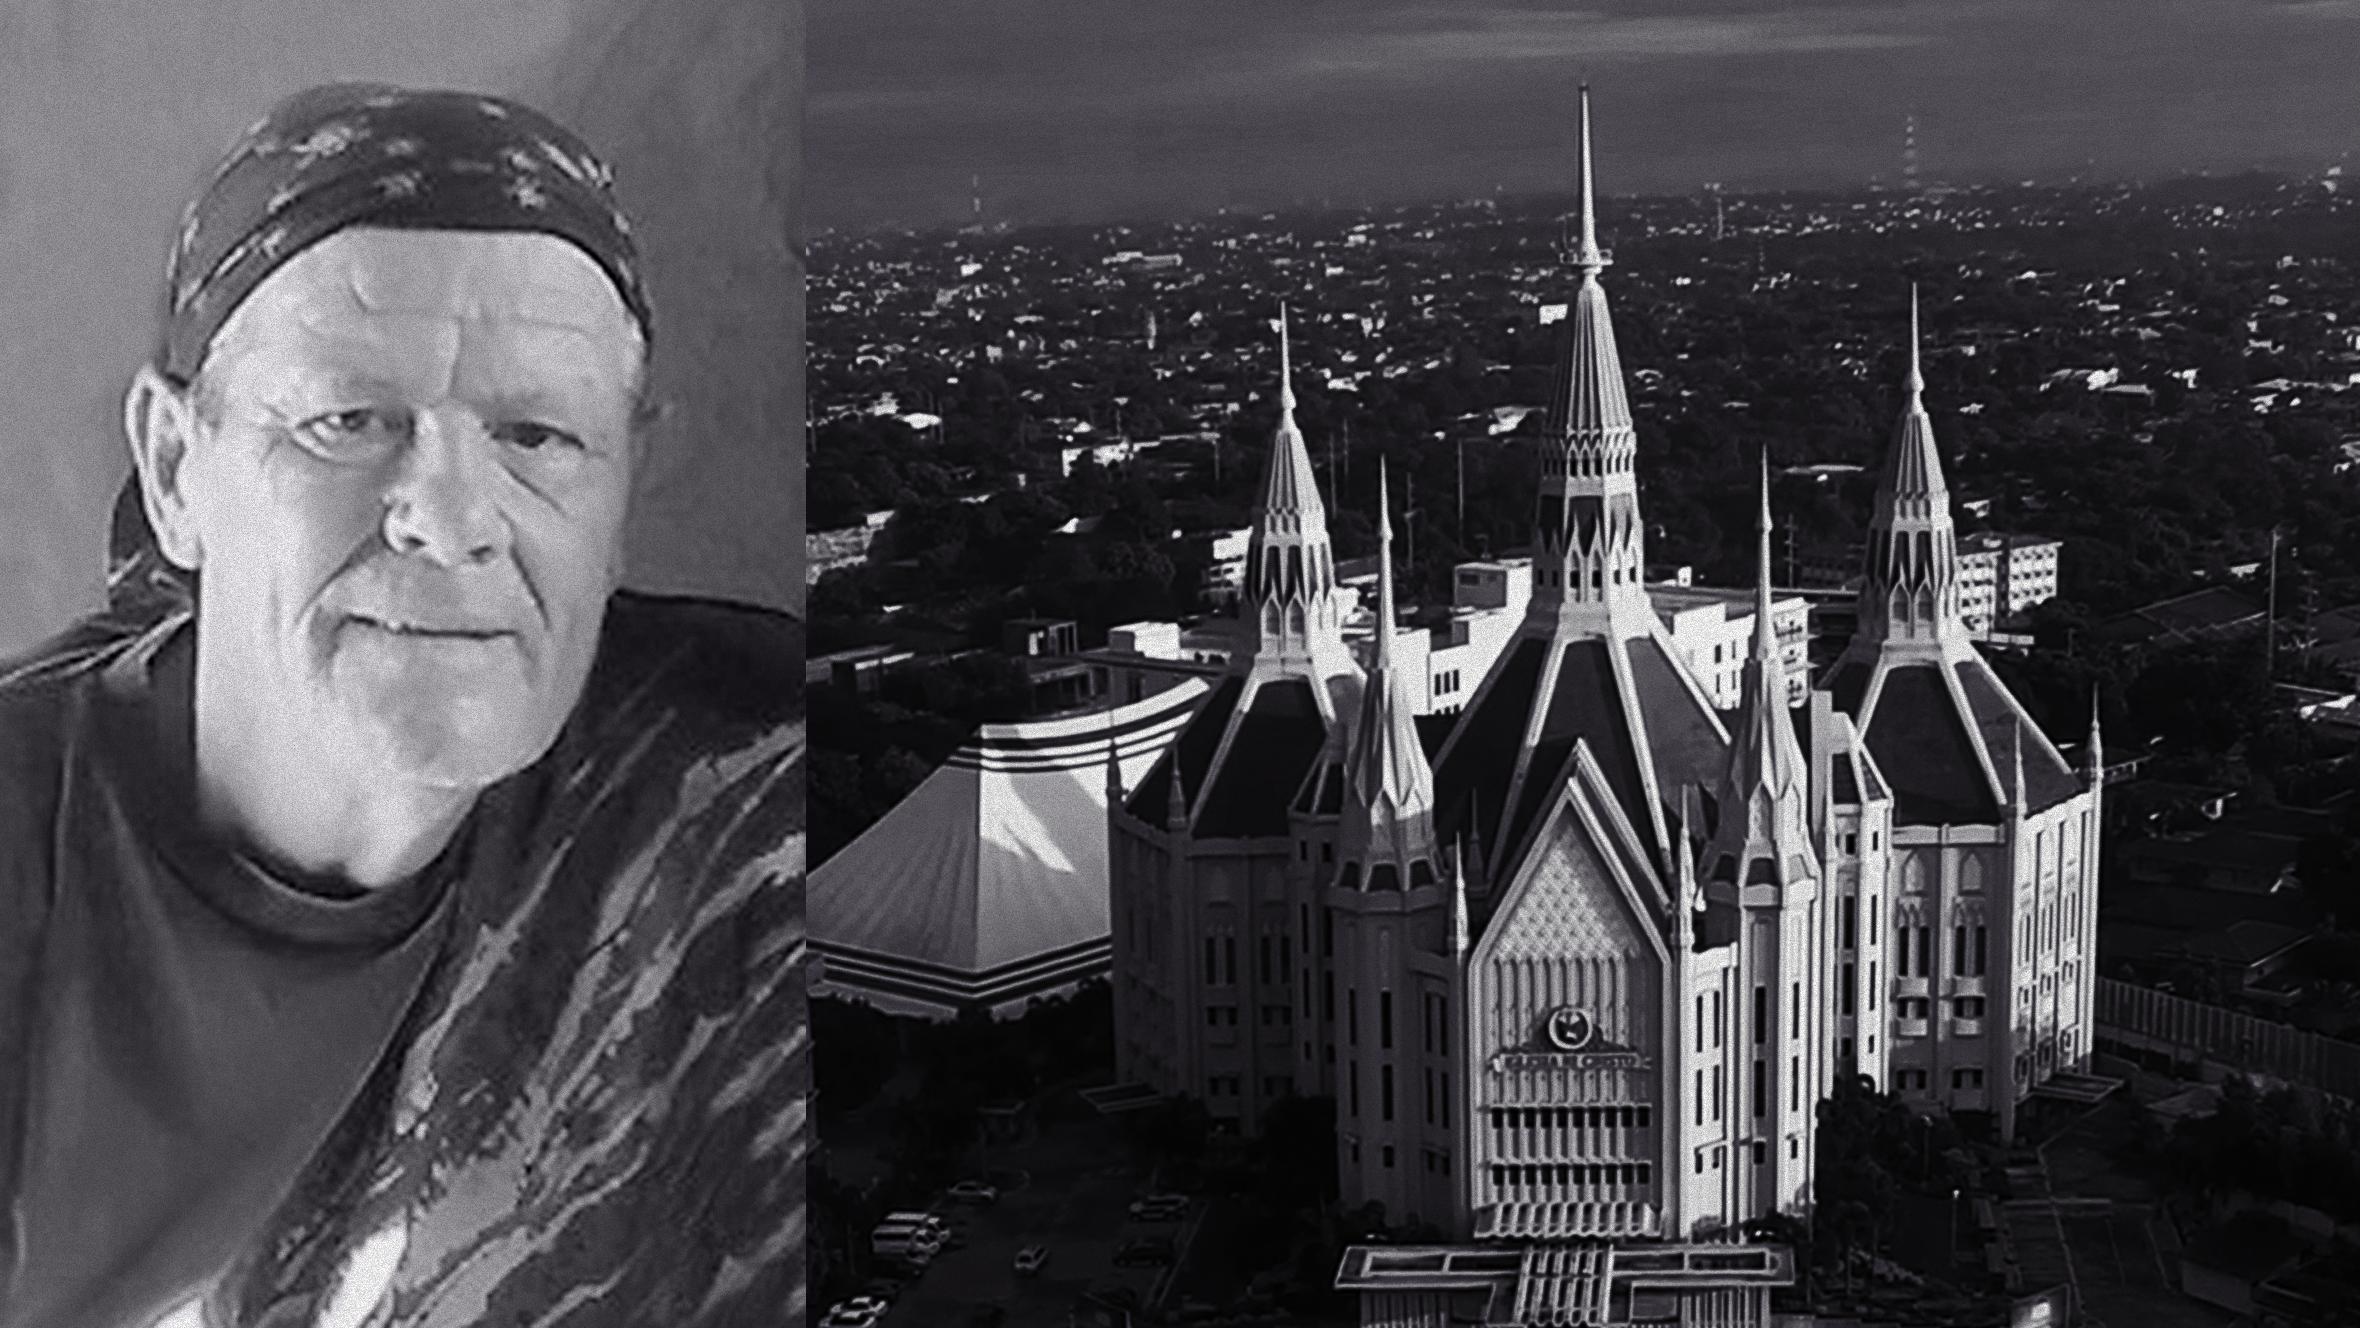 crime corruption church accountability violence fascism